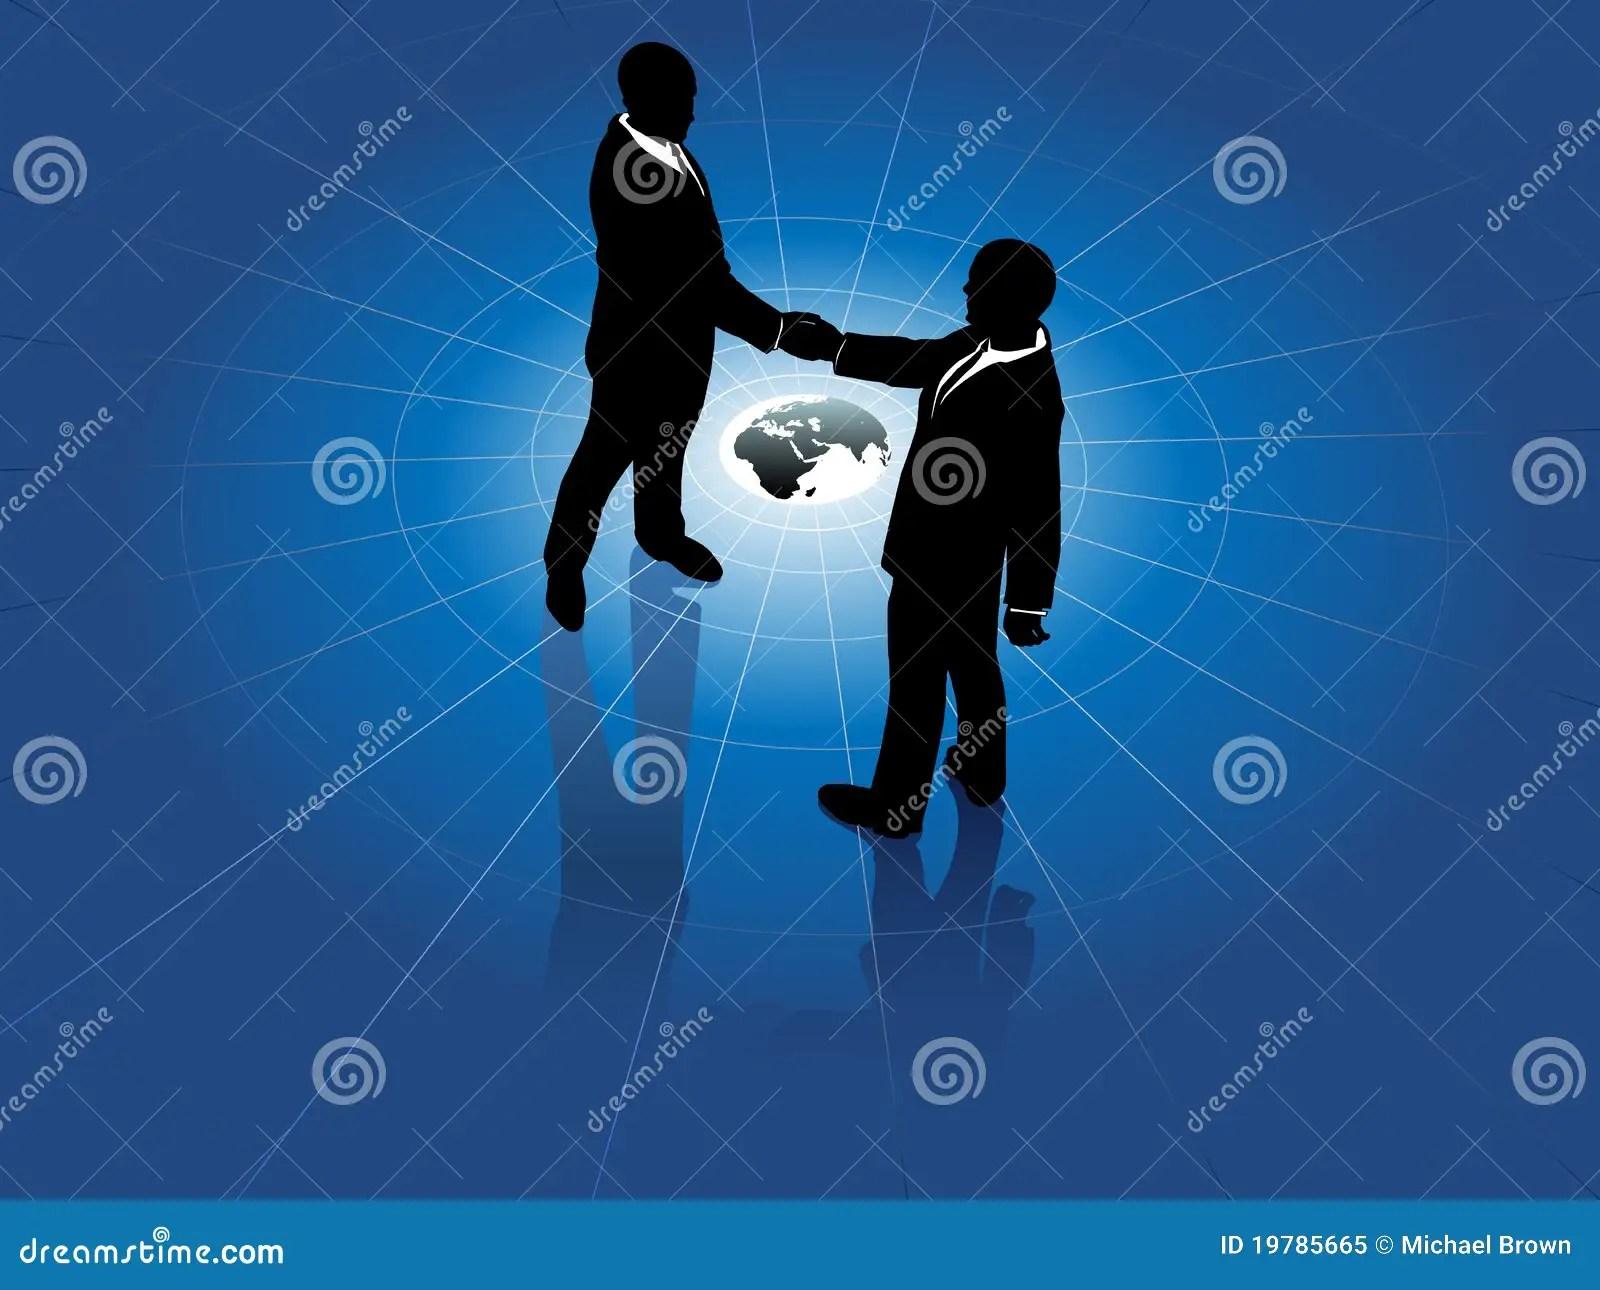 3d All Wallpaper Free Download Global Business Men Handshake World Agreement Royalty Free